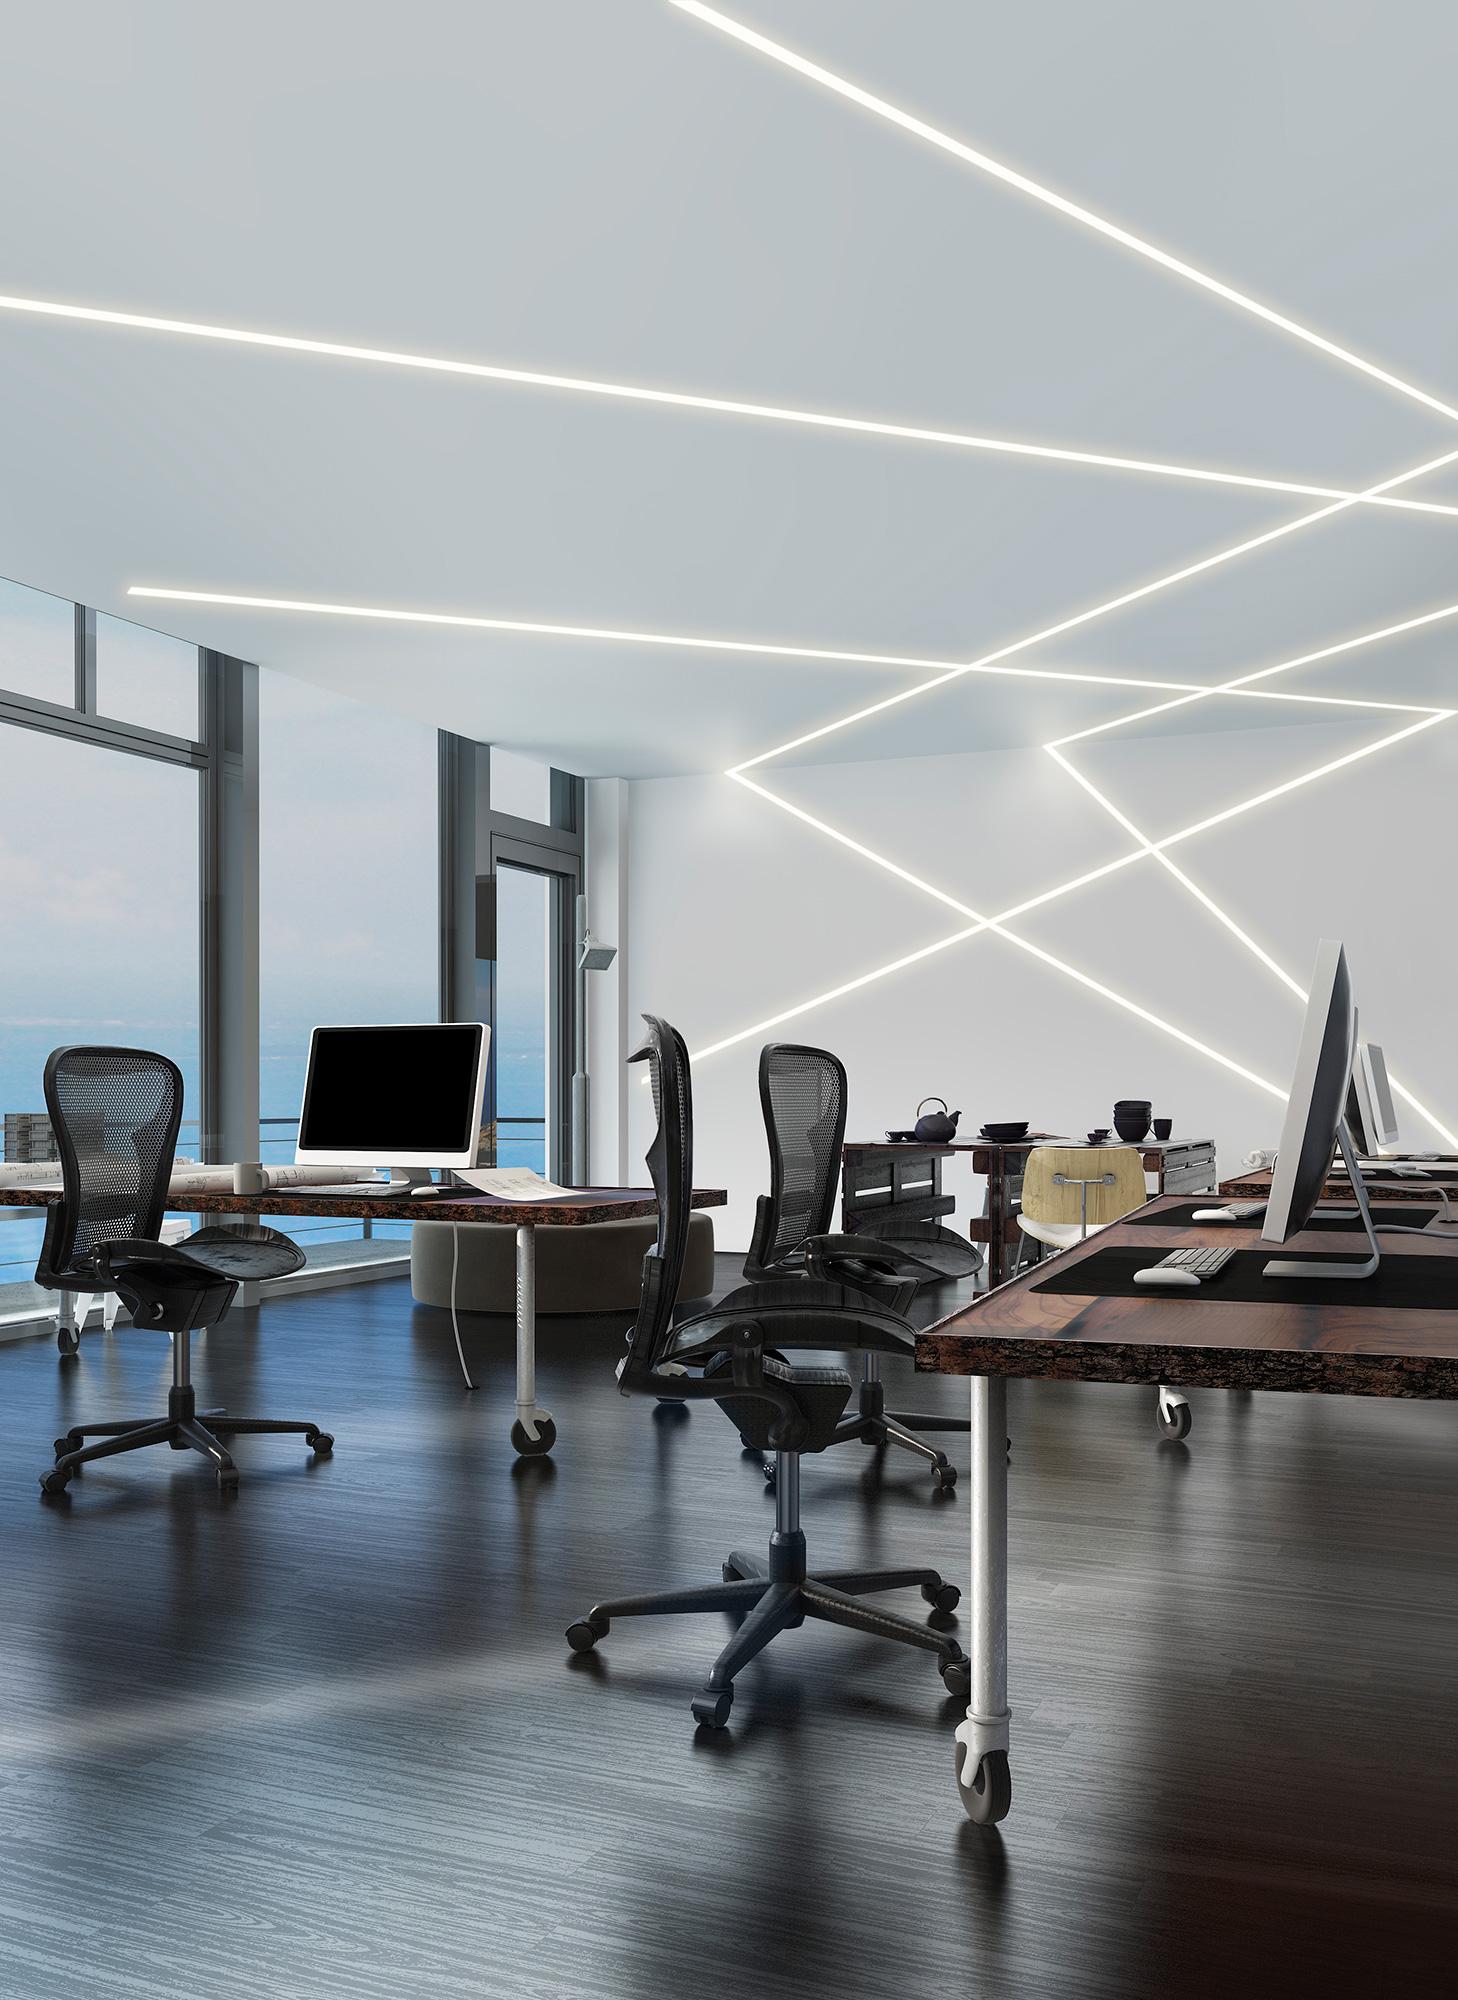 Installation Gallery Office Lighting